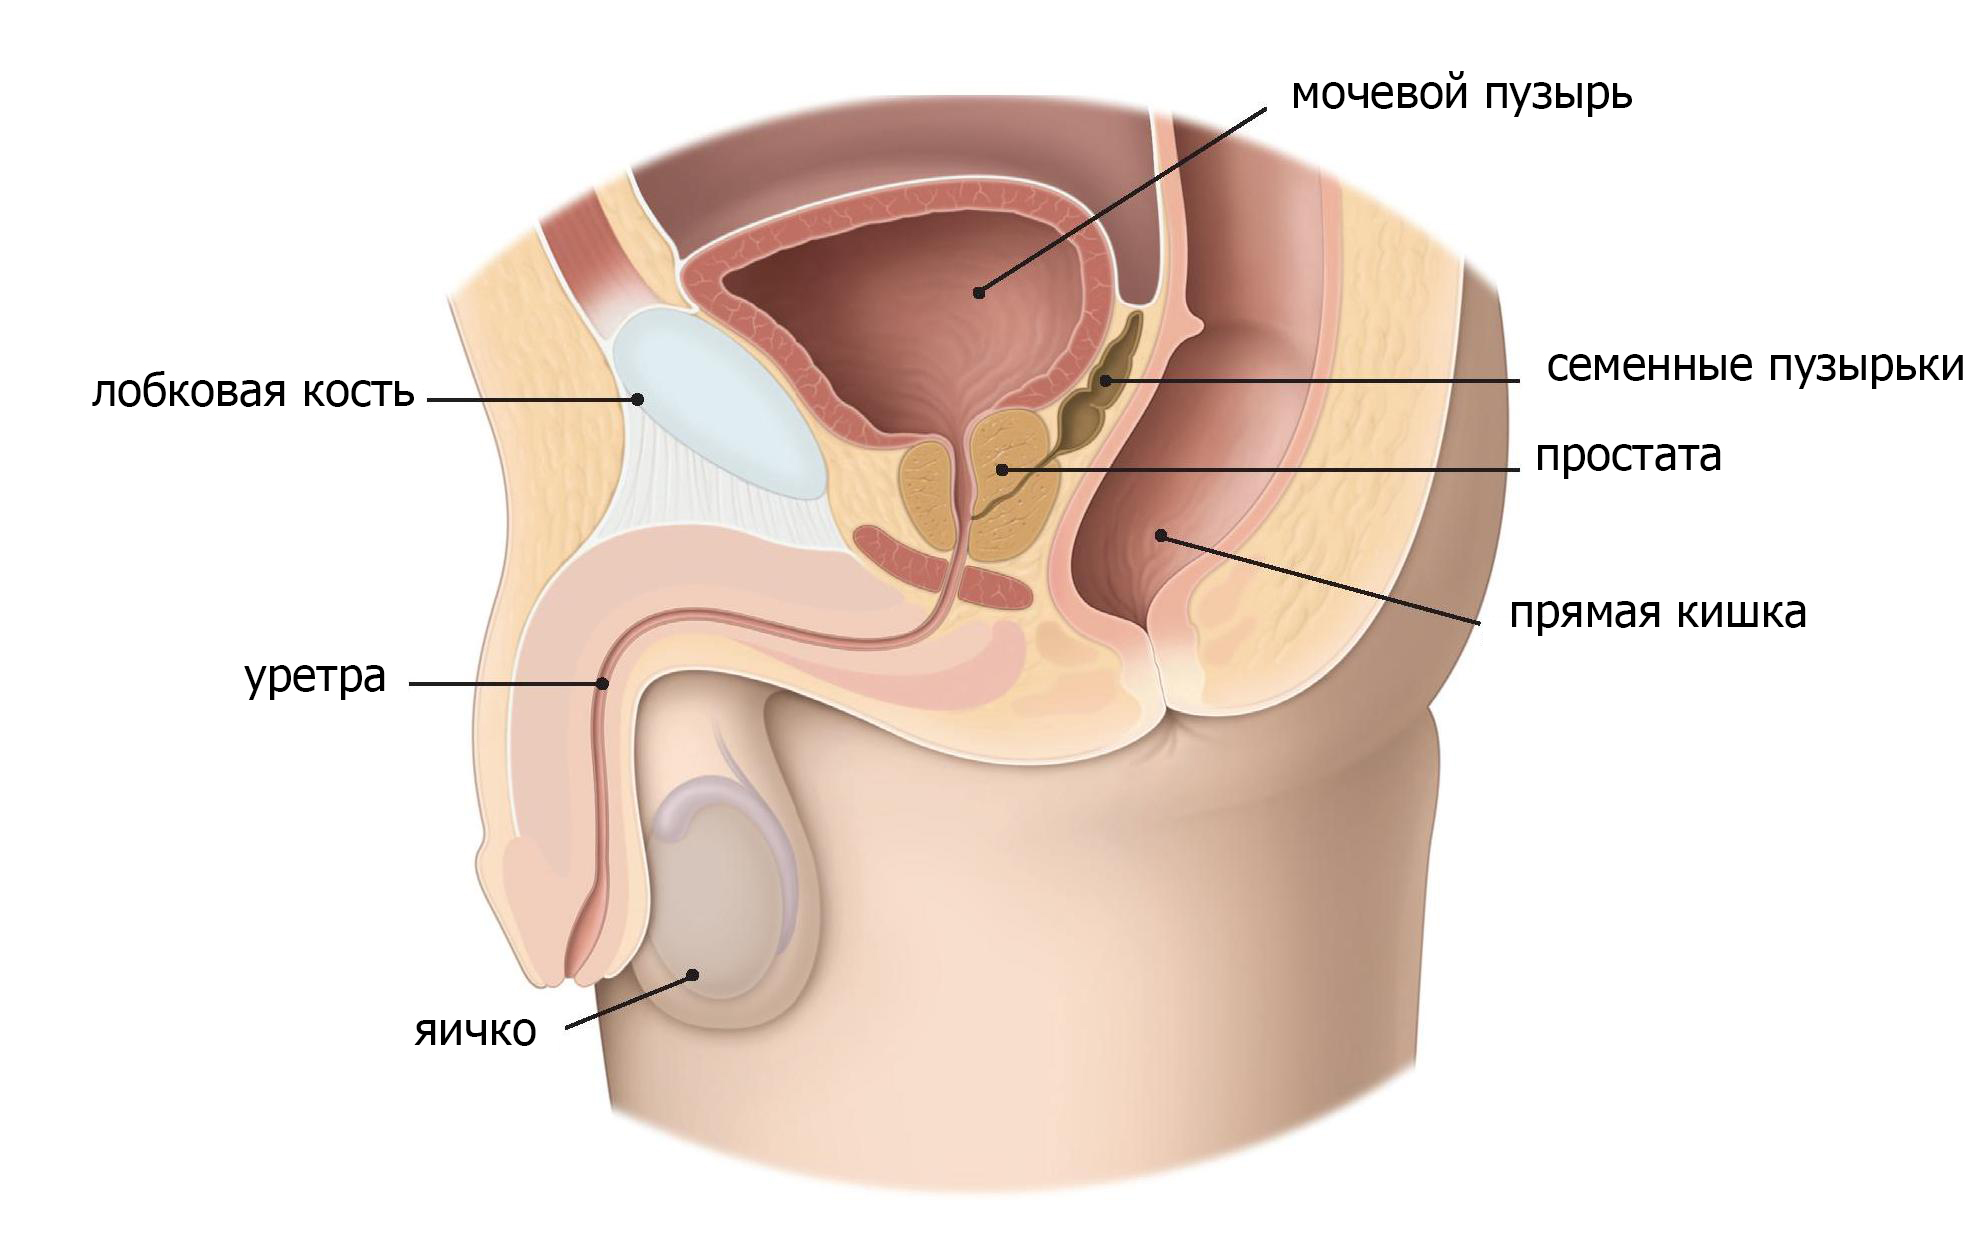 Предстательная железа у мужчин картинки